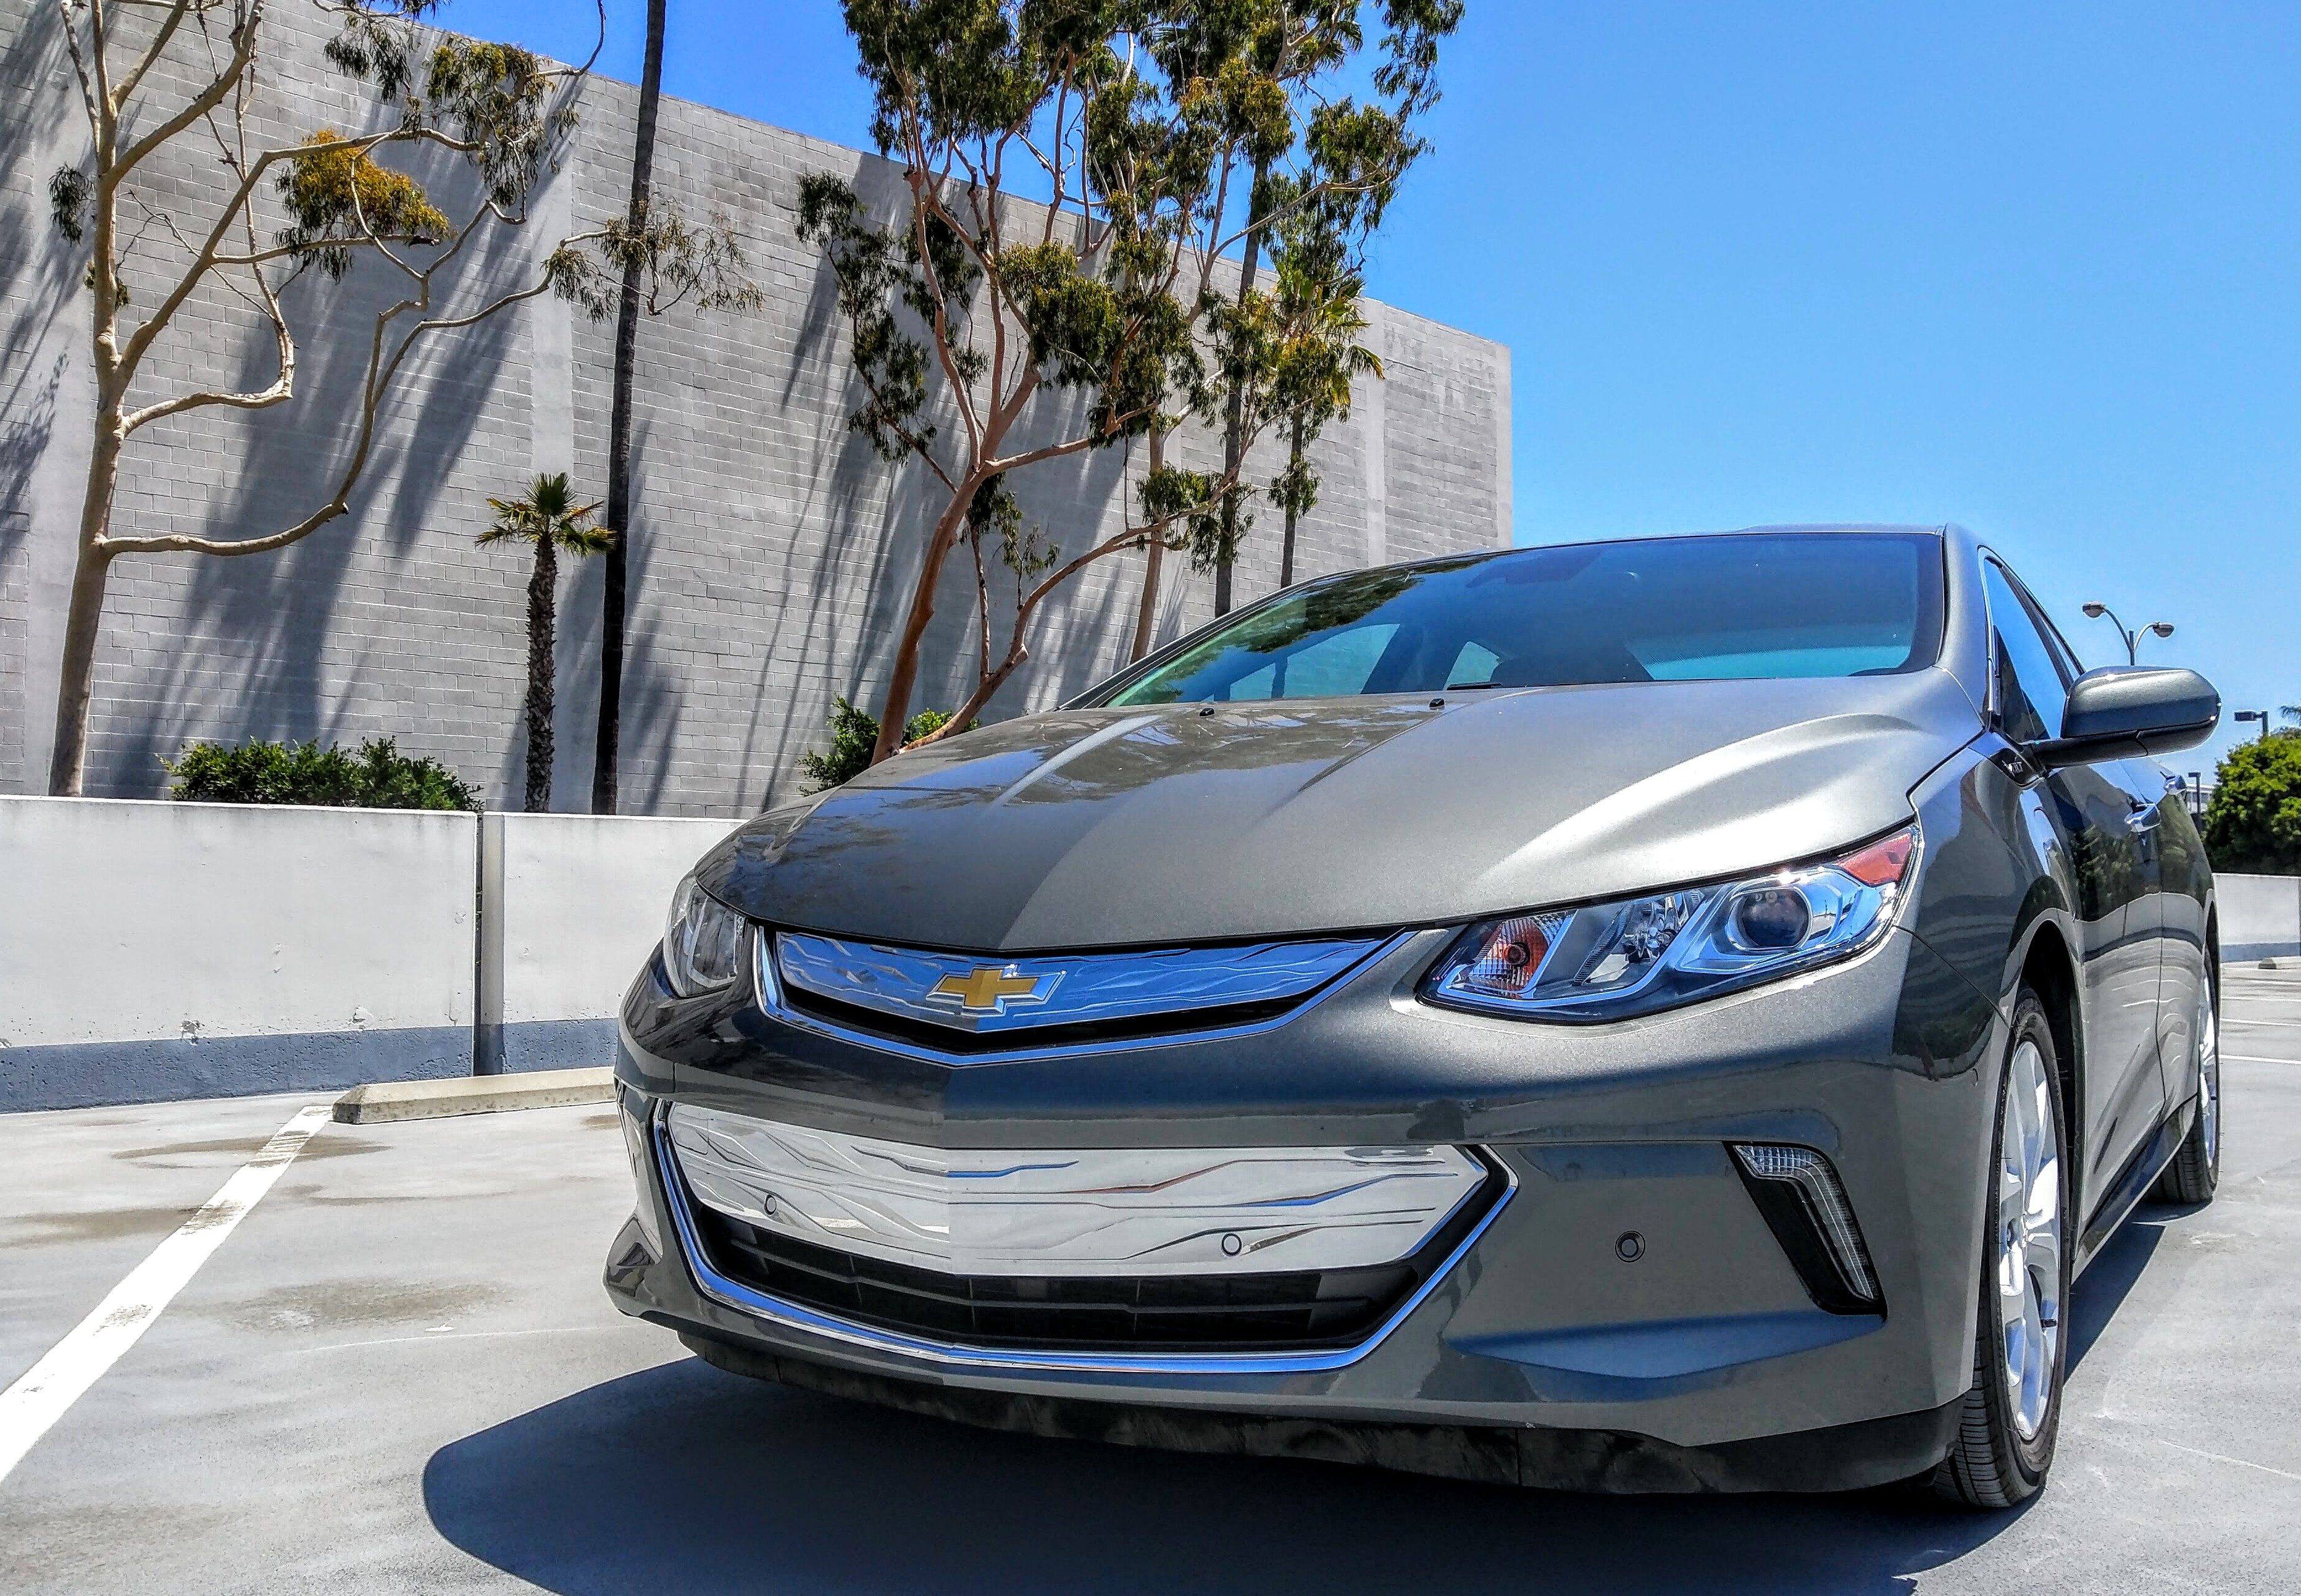 info specs hybrid chevrolet and volt reviews price photo s driver in photos car plug official original